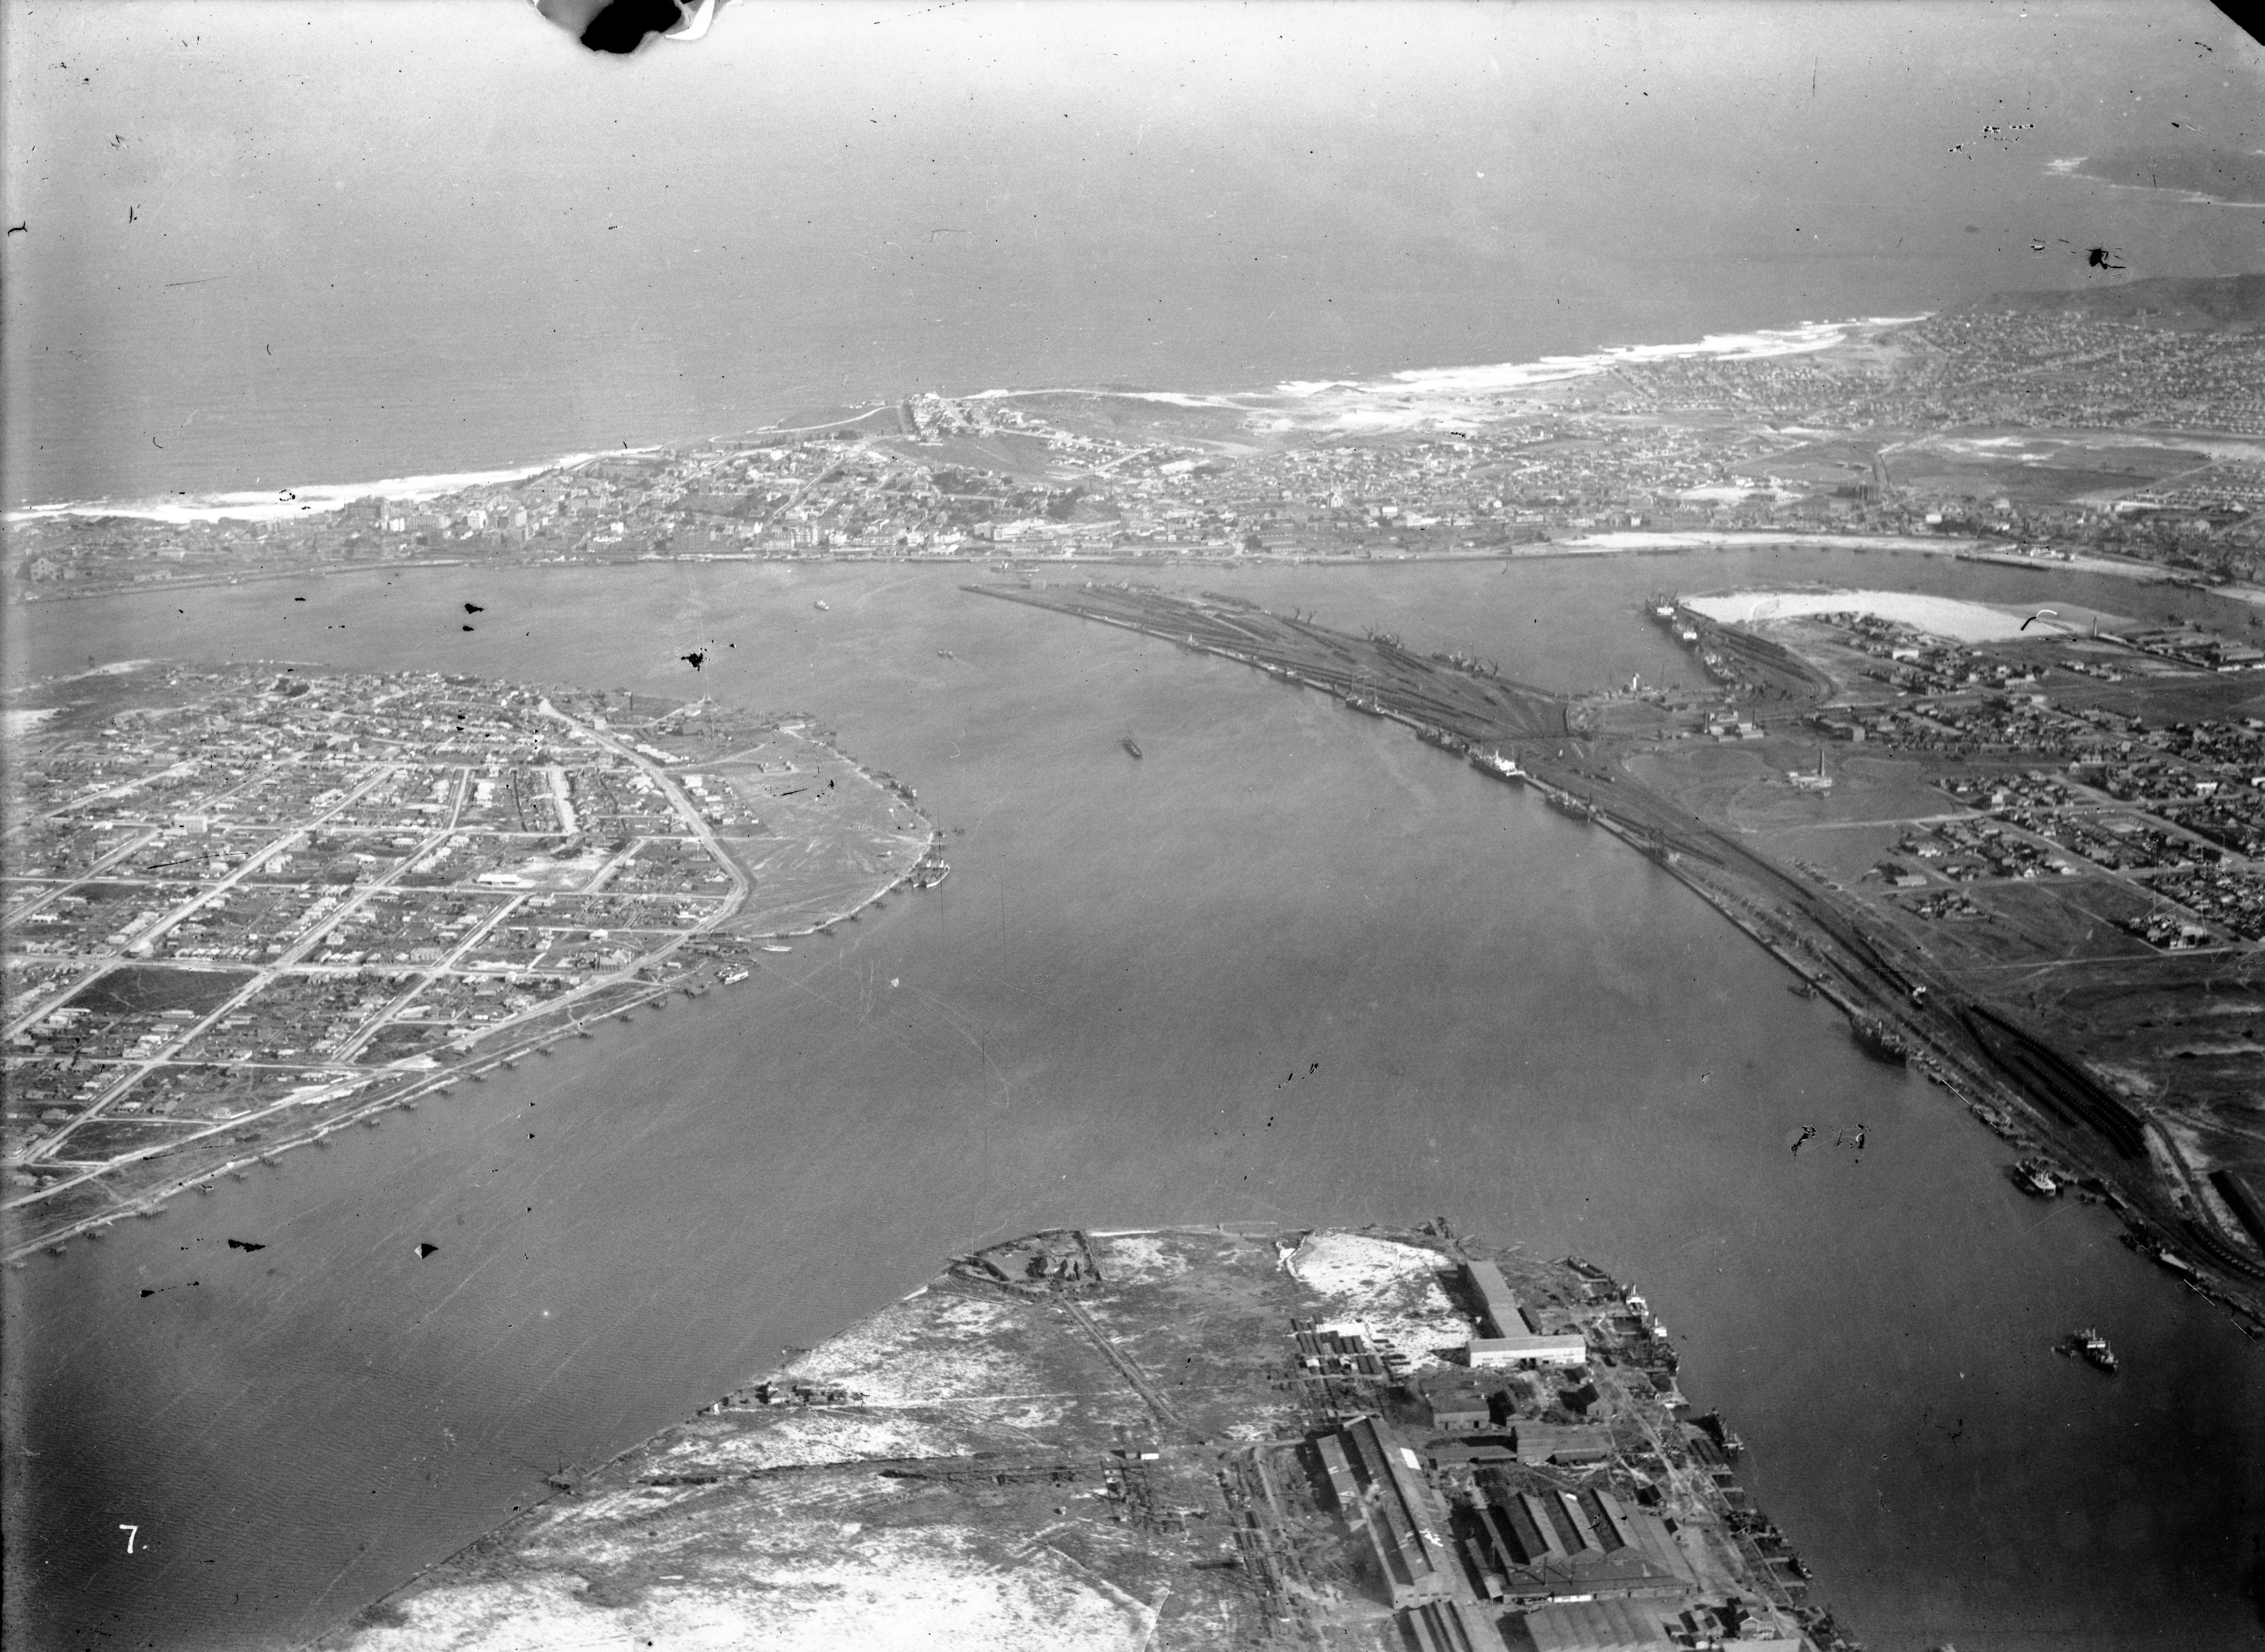 Newcastle, Port Hunter, Stockton, Walsh Island, The Dyke, Carrington, The Basin, Bullock Island, Throsby Creek. (Photograph by Milton Kent Airplane Photographs, Sydney. Southern No. 57.3.-.7.1930.S.jpg)